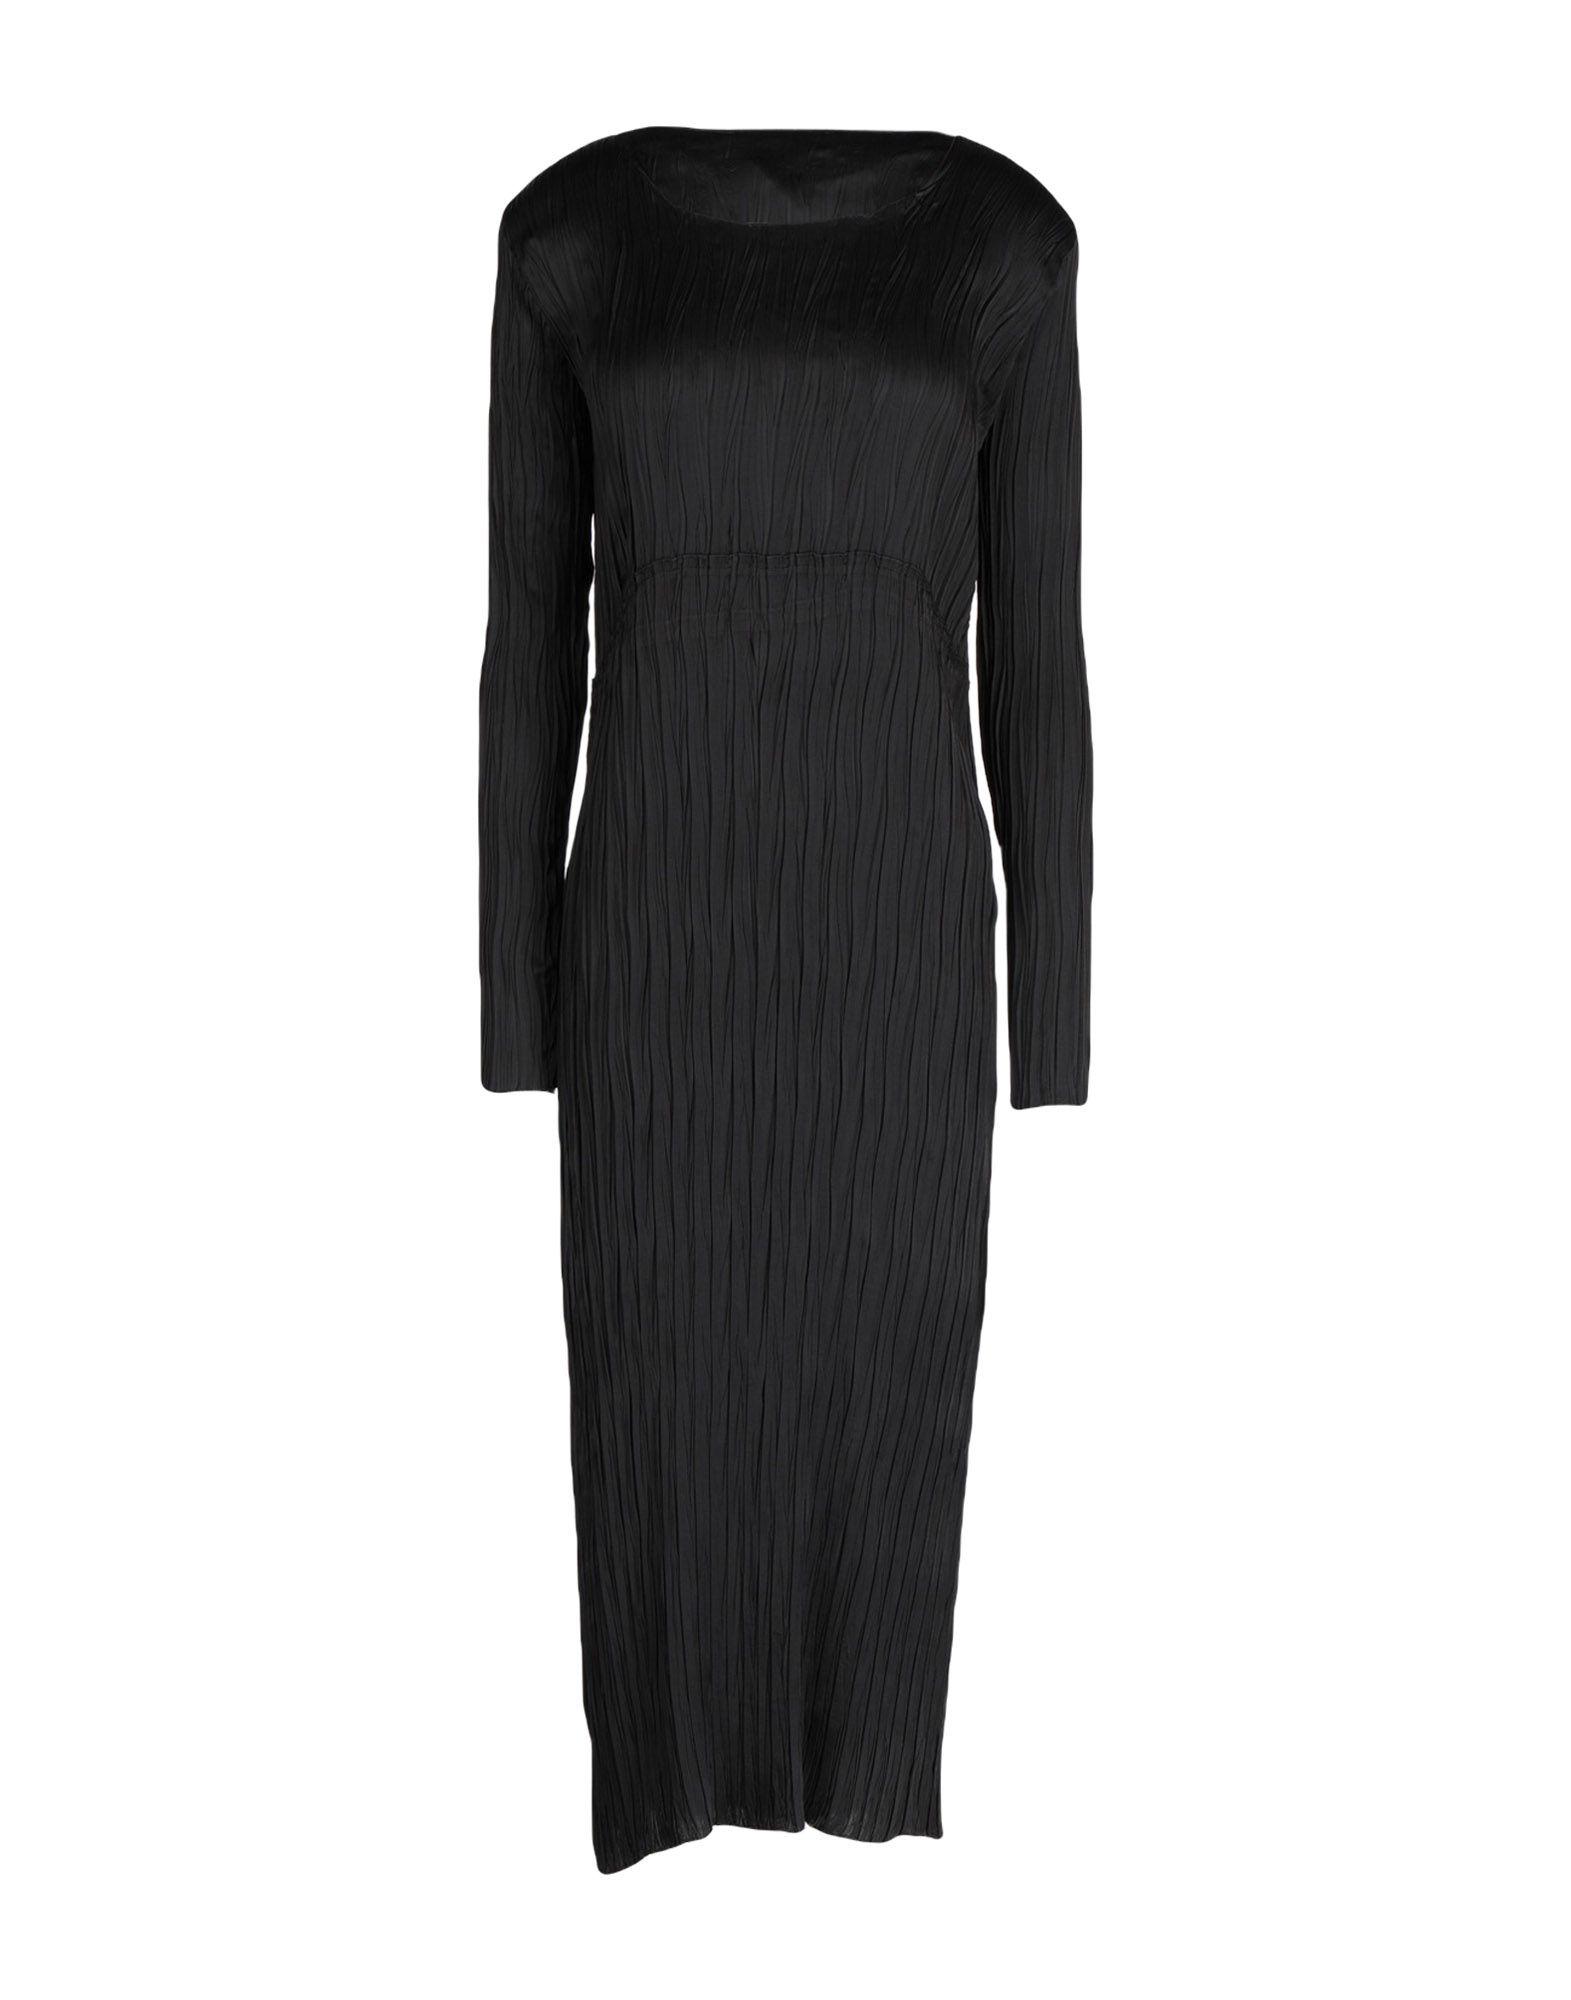 KATIA GIANNINI Платье длиной 3/4 katia g юбка длиной 3 4